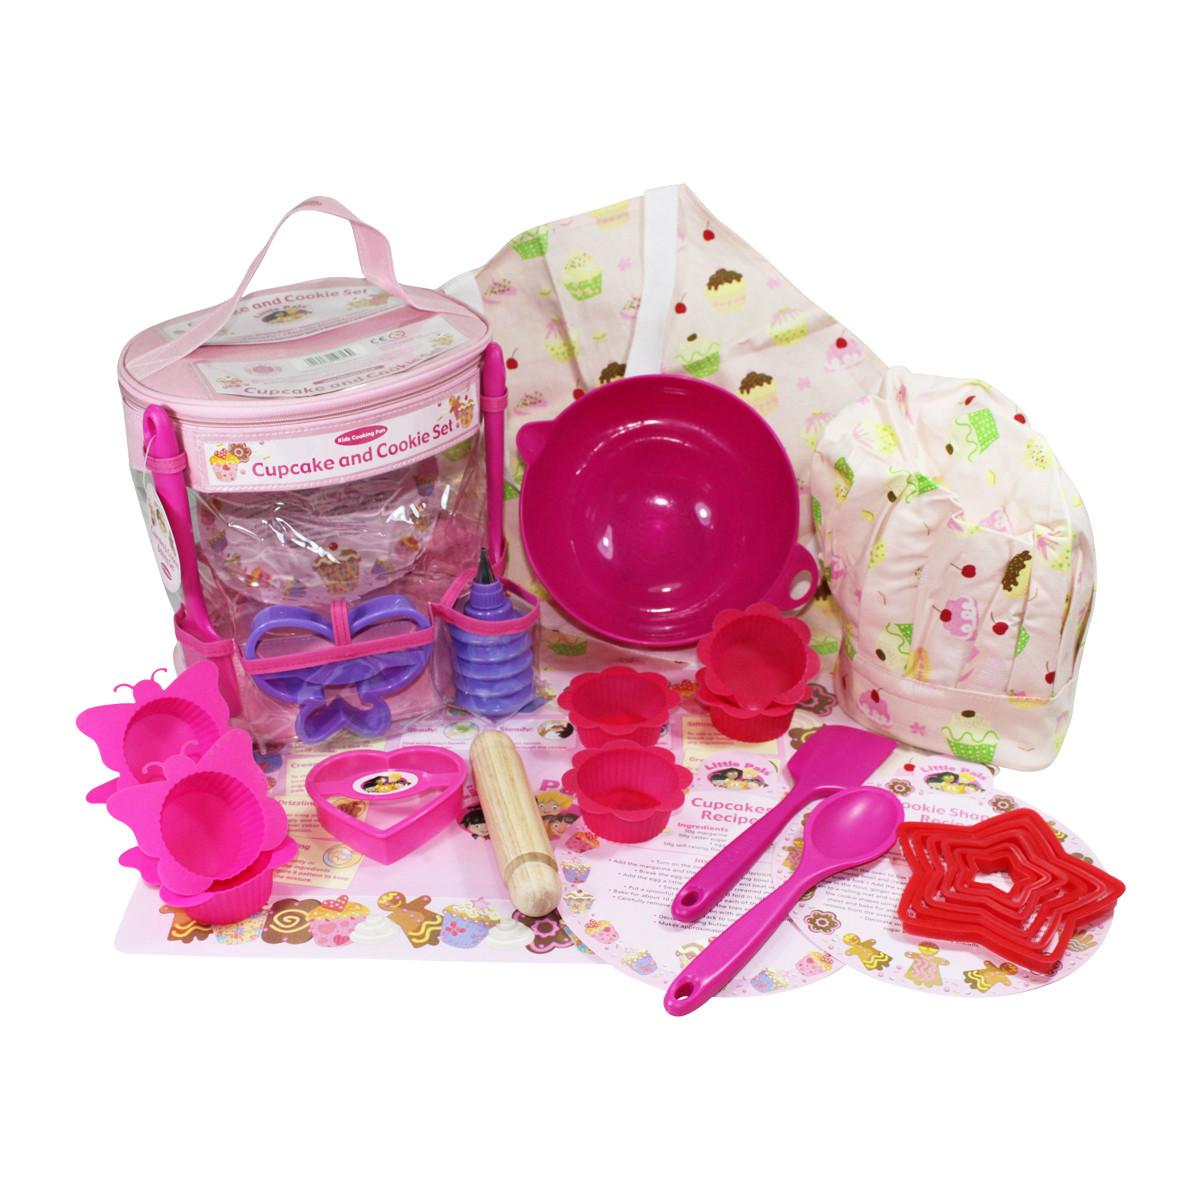 Kids Gift Sets  plete Childrens Baking Set Pink